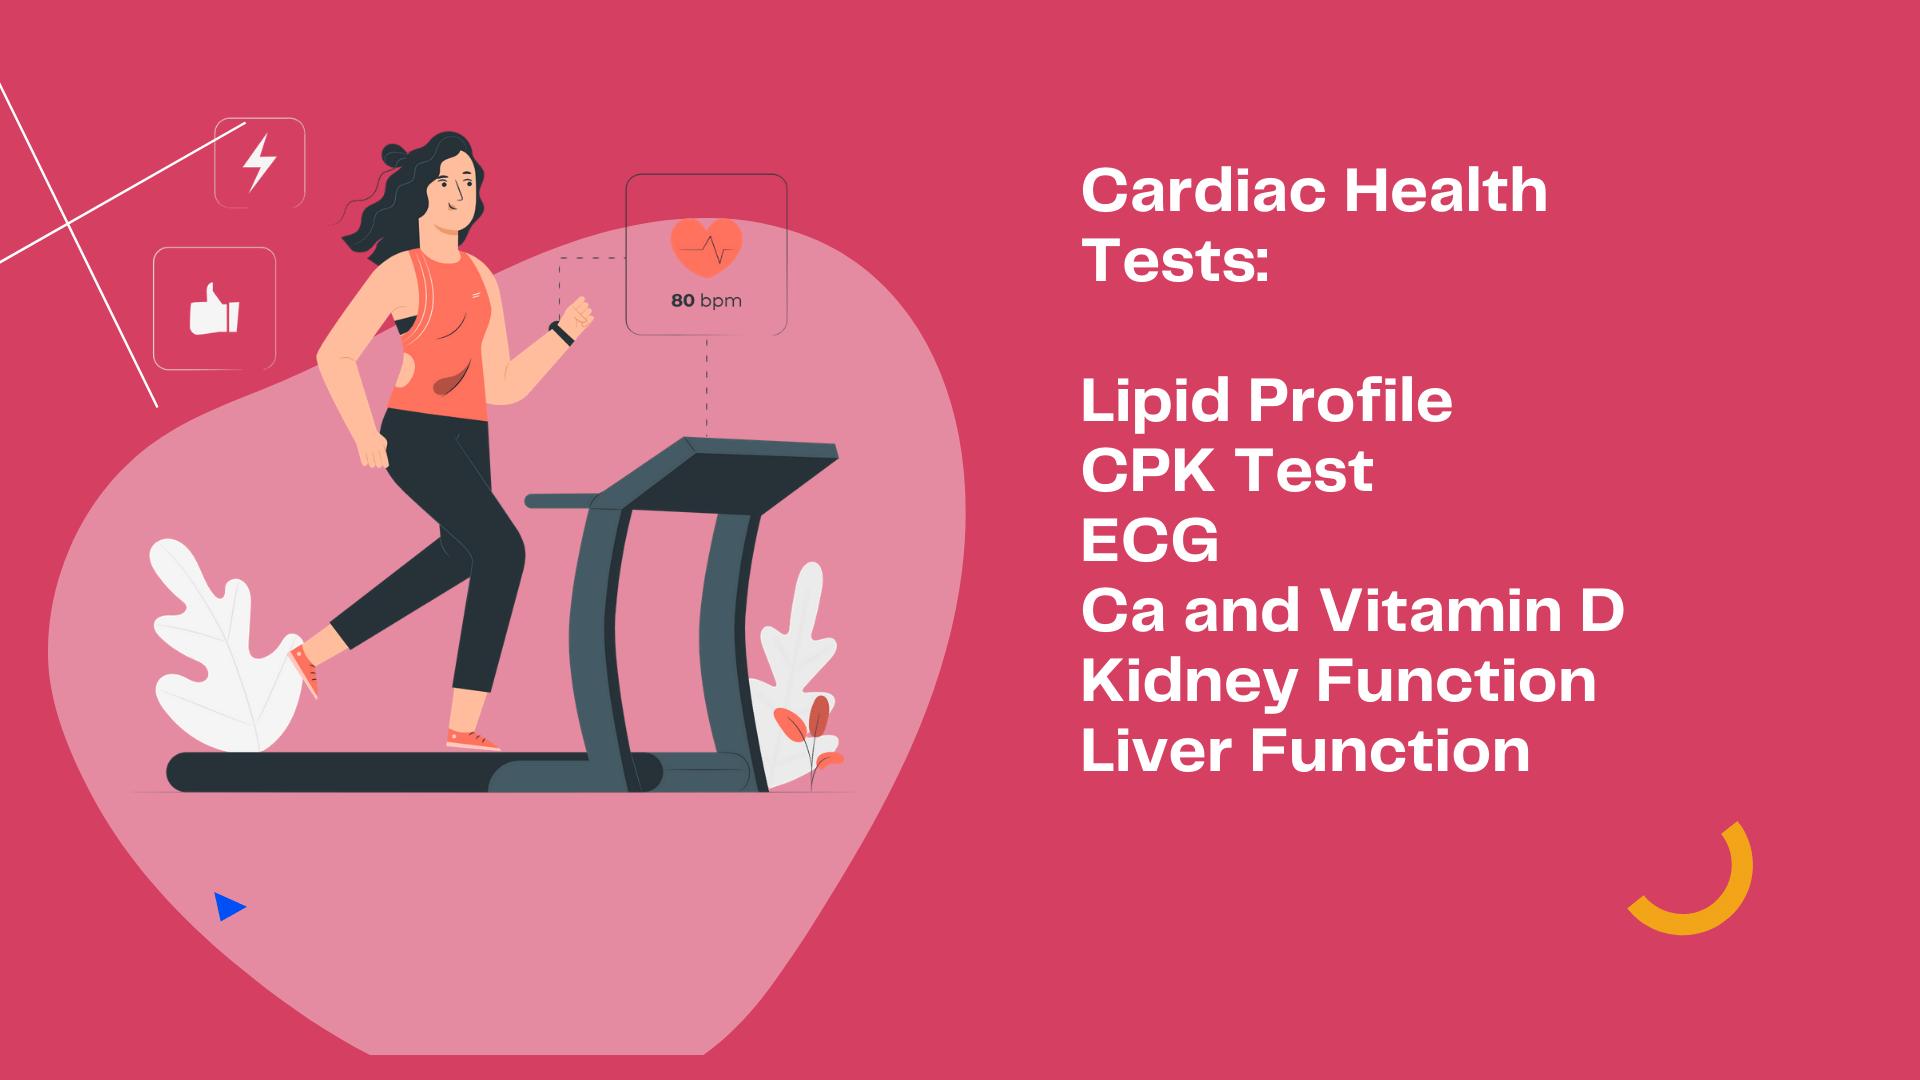 Typical Cardiac Health Tests